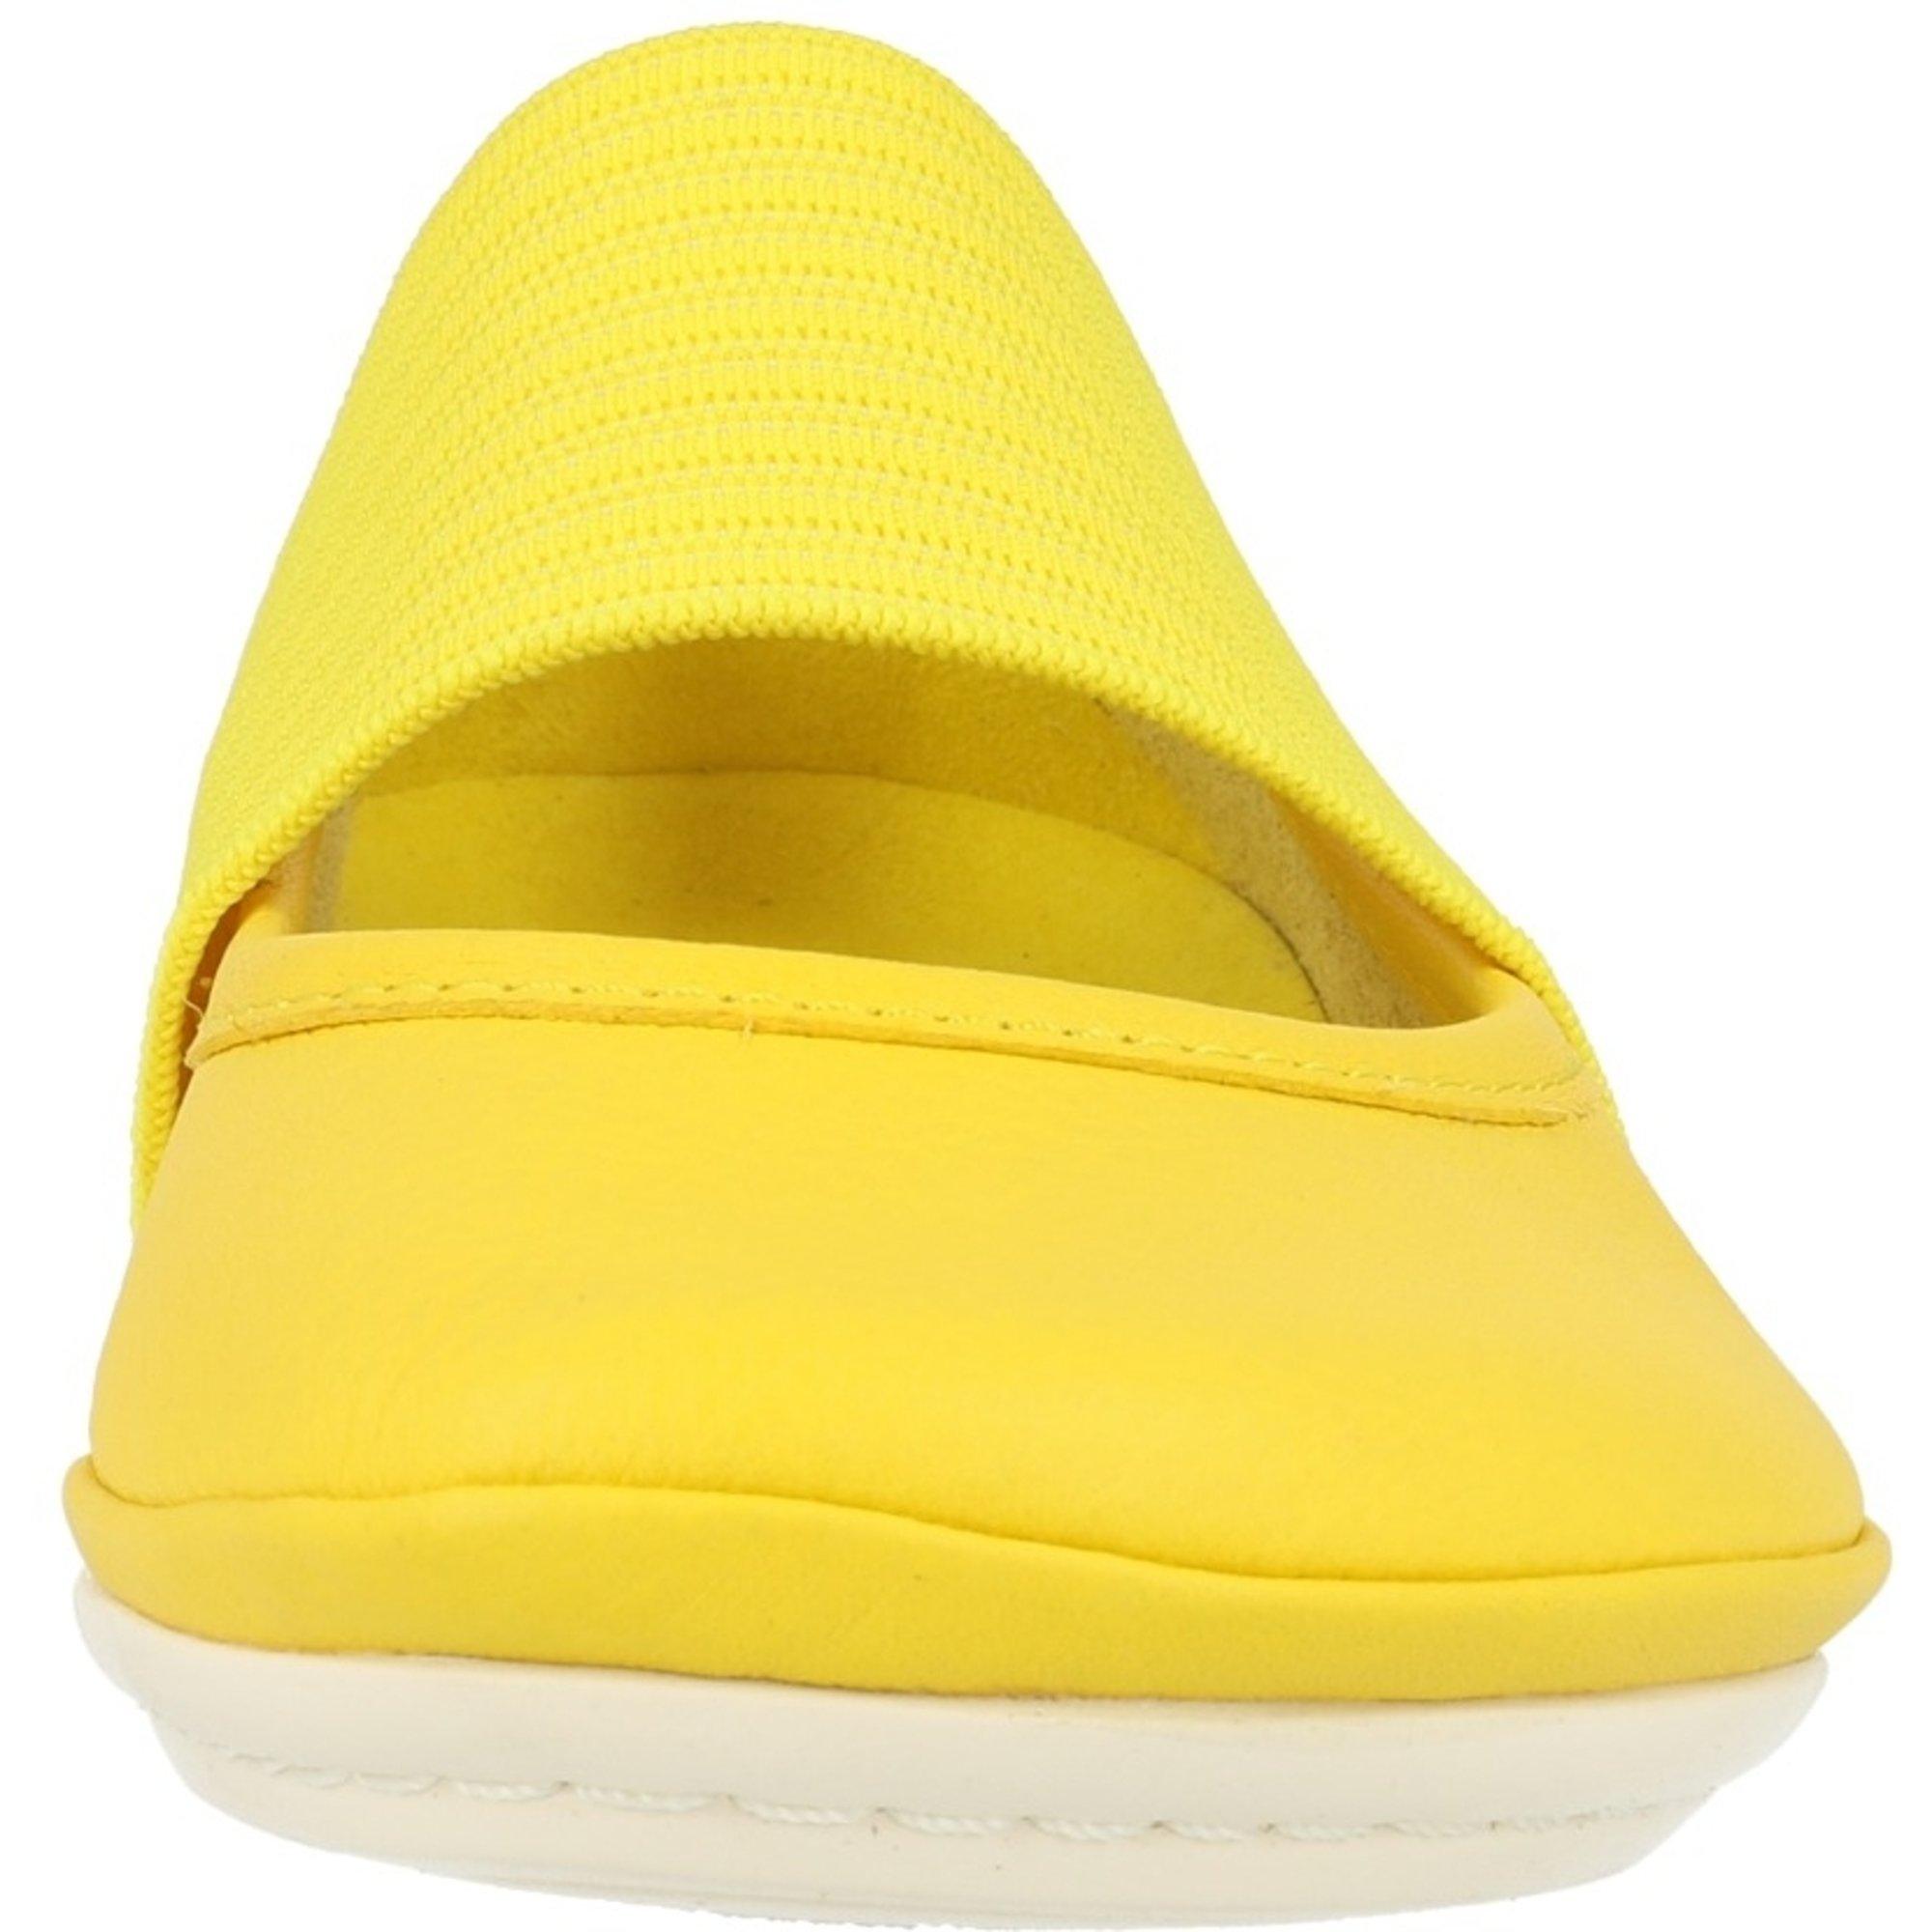 Camper Right Medium Yellow Leather